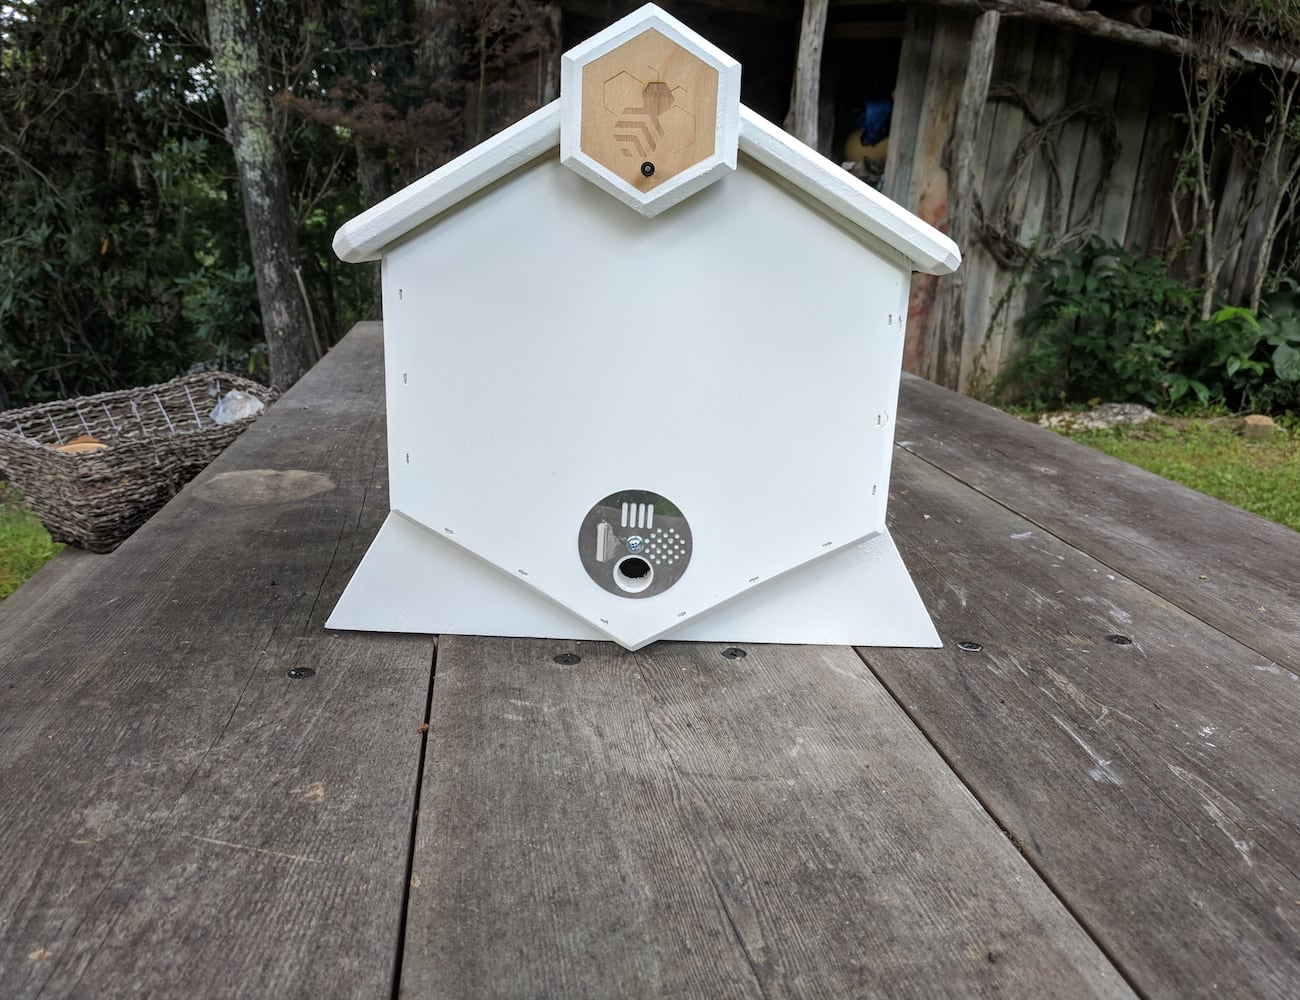 Honeycomb Hive Integrative Beekeeping System